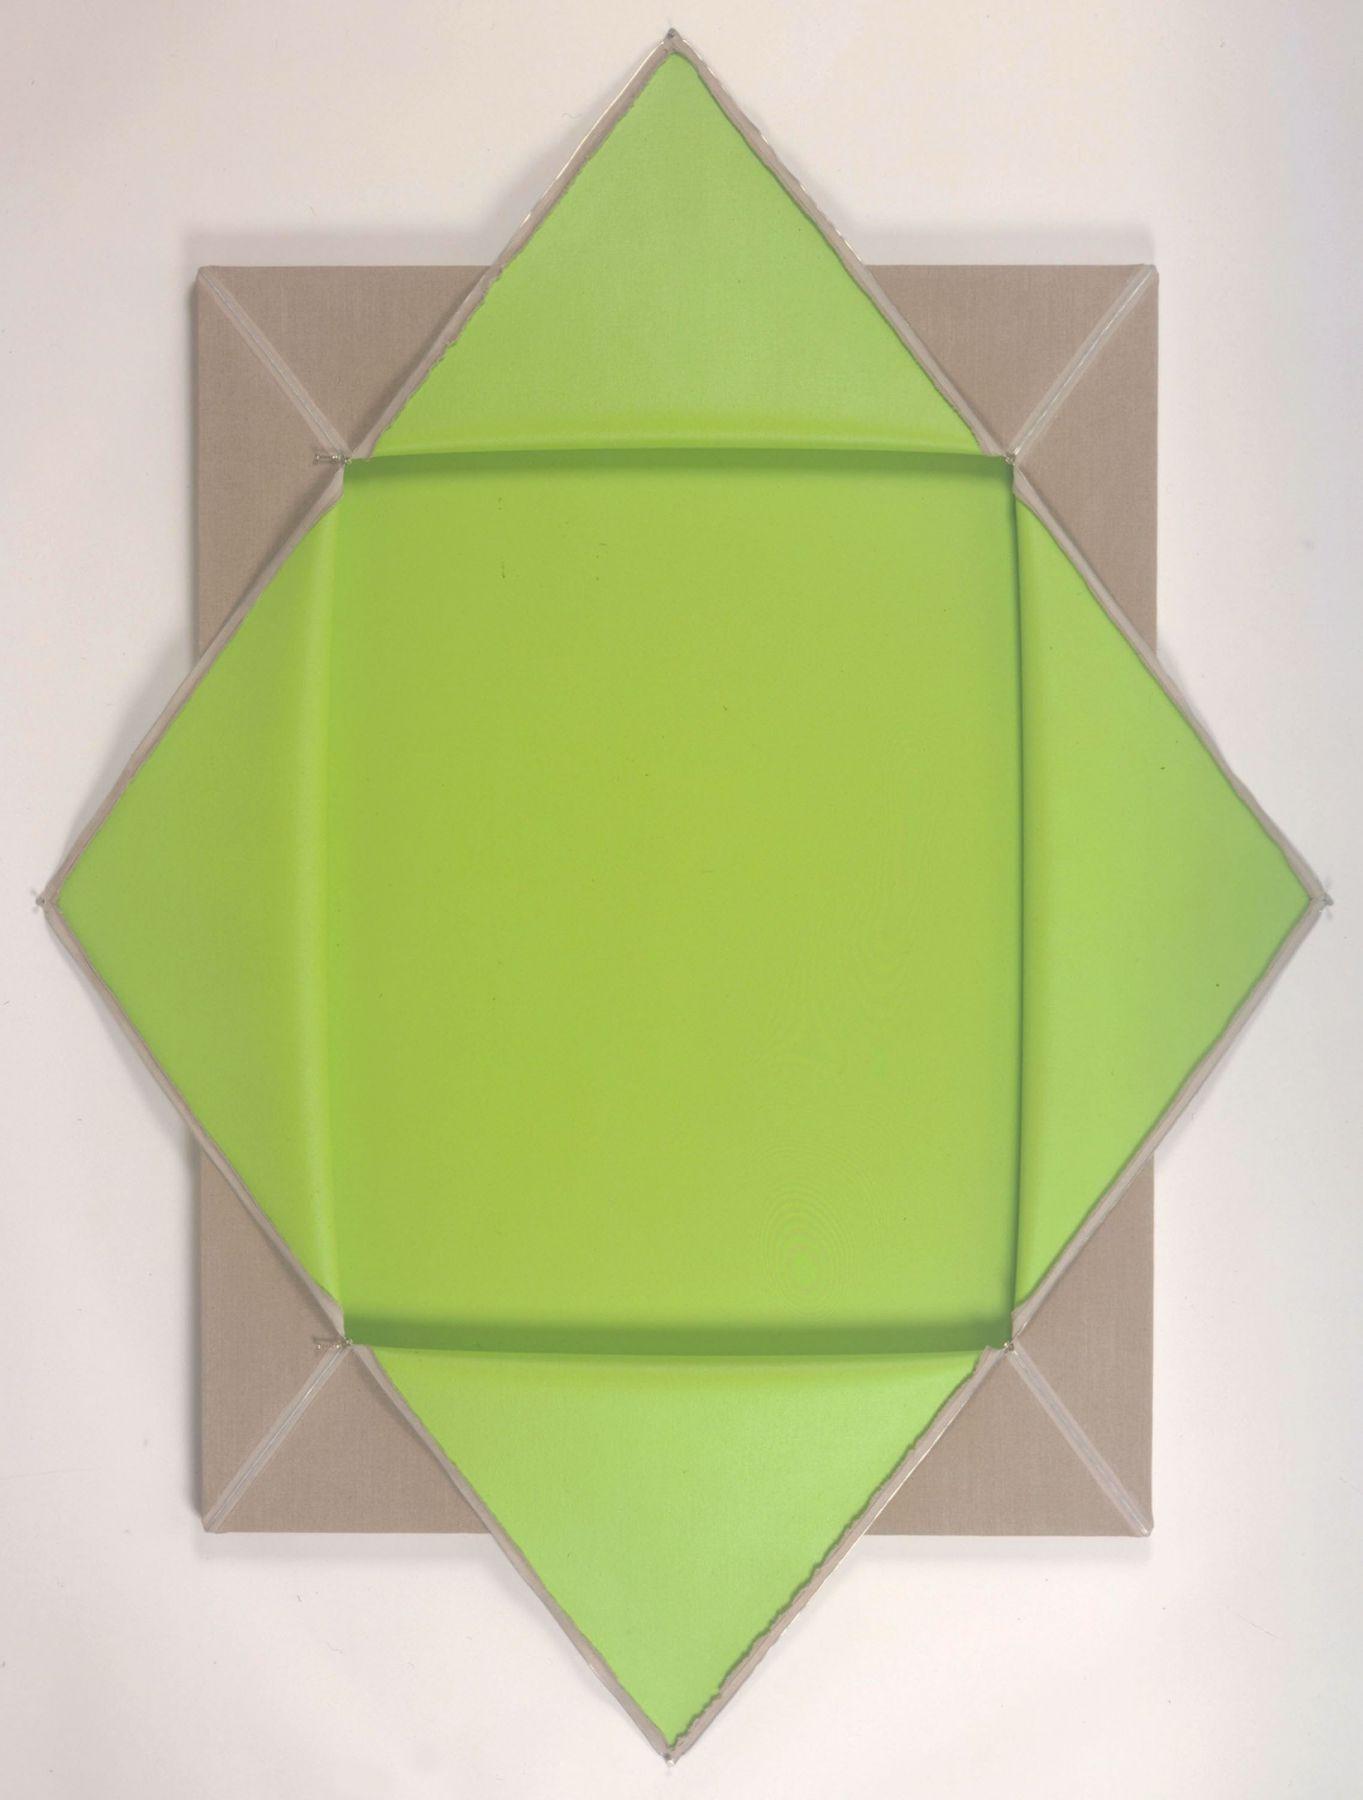 green and beige sculpture by donald moffett